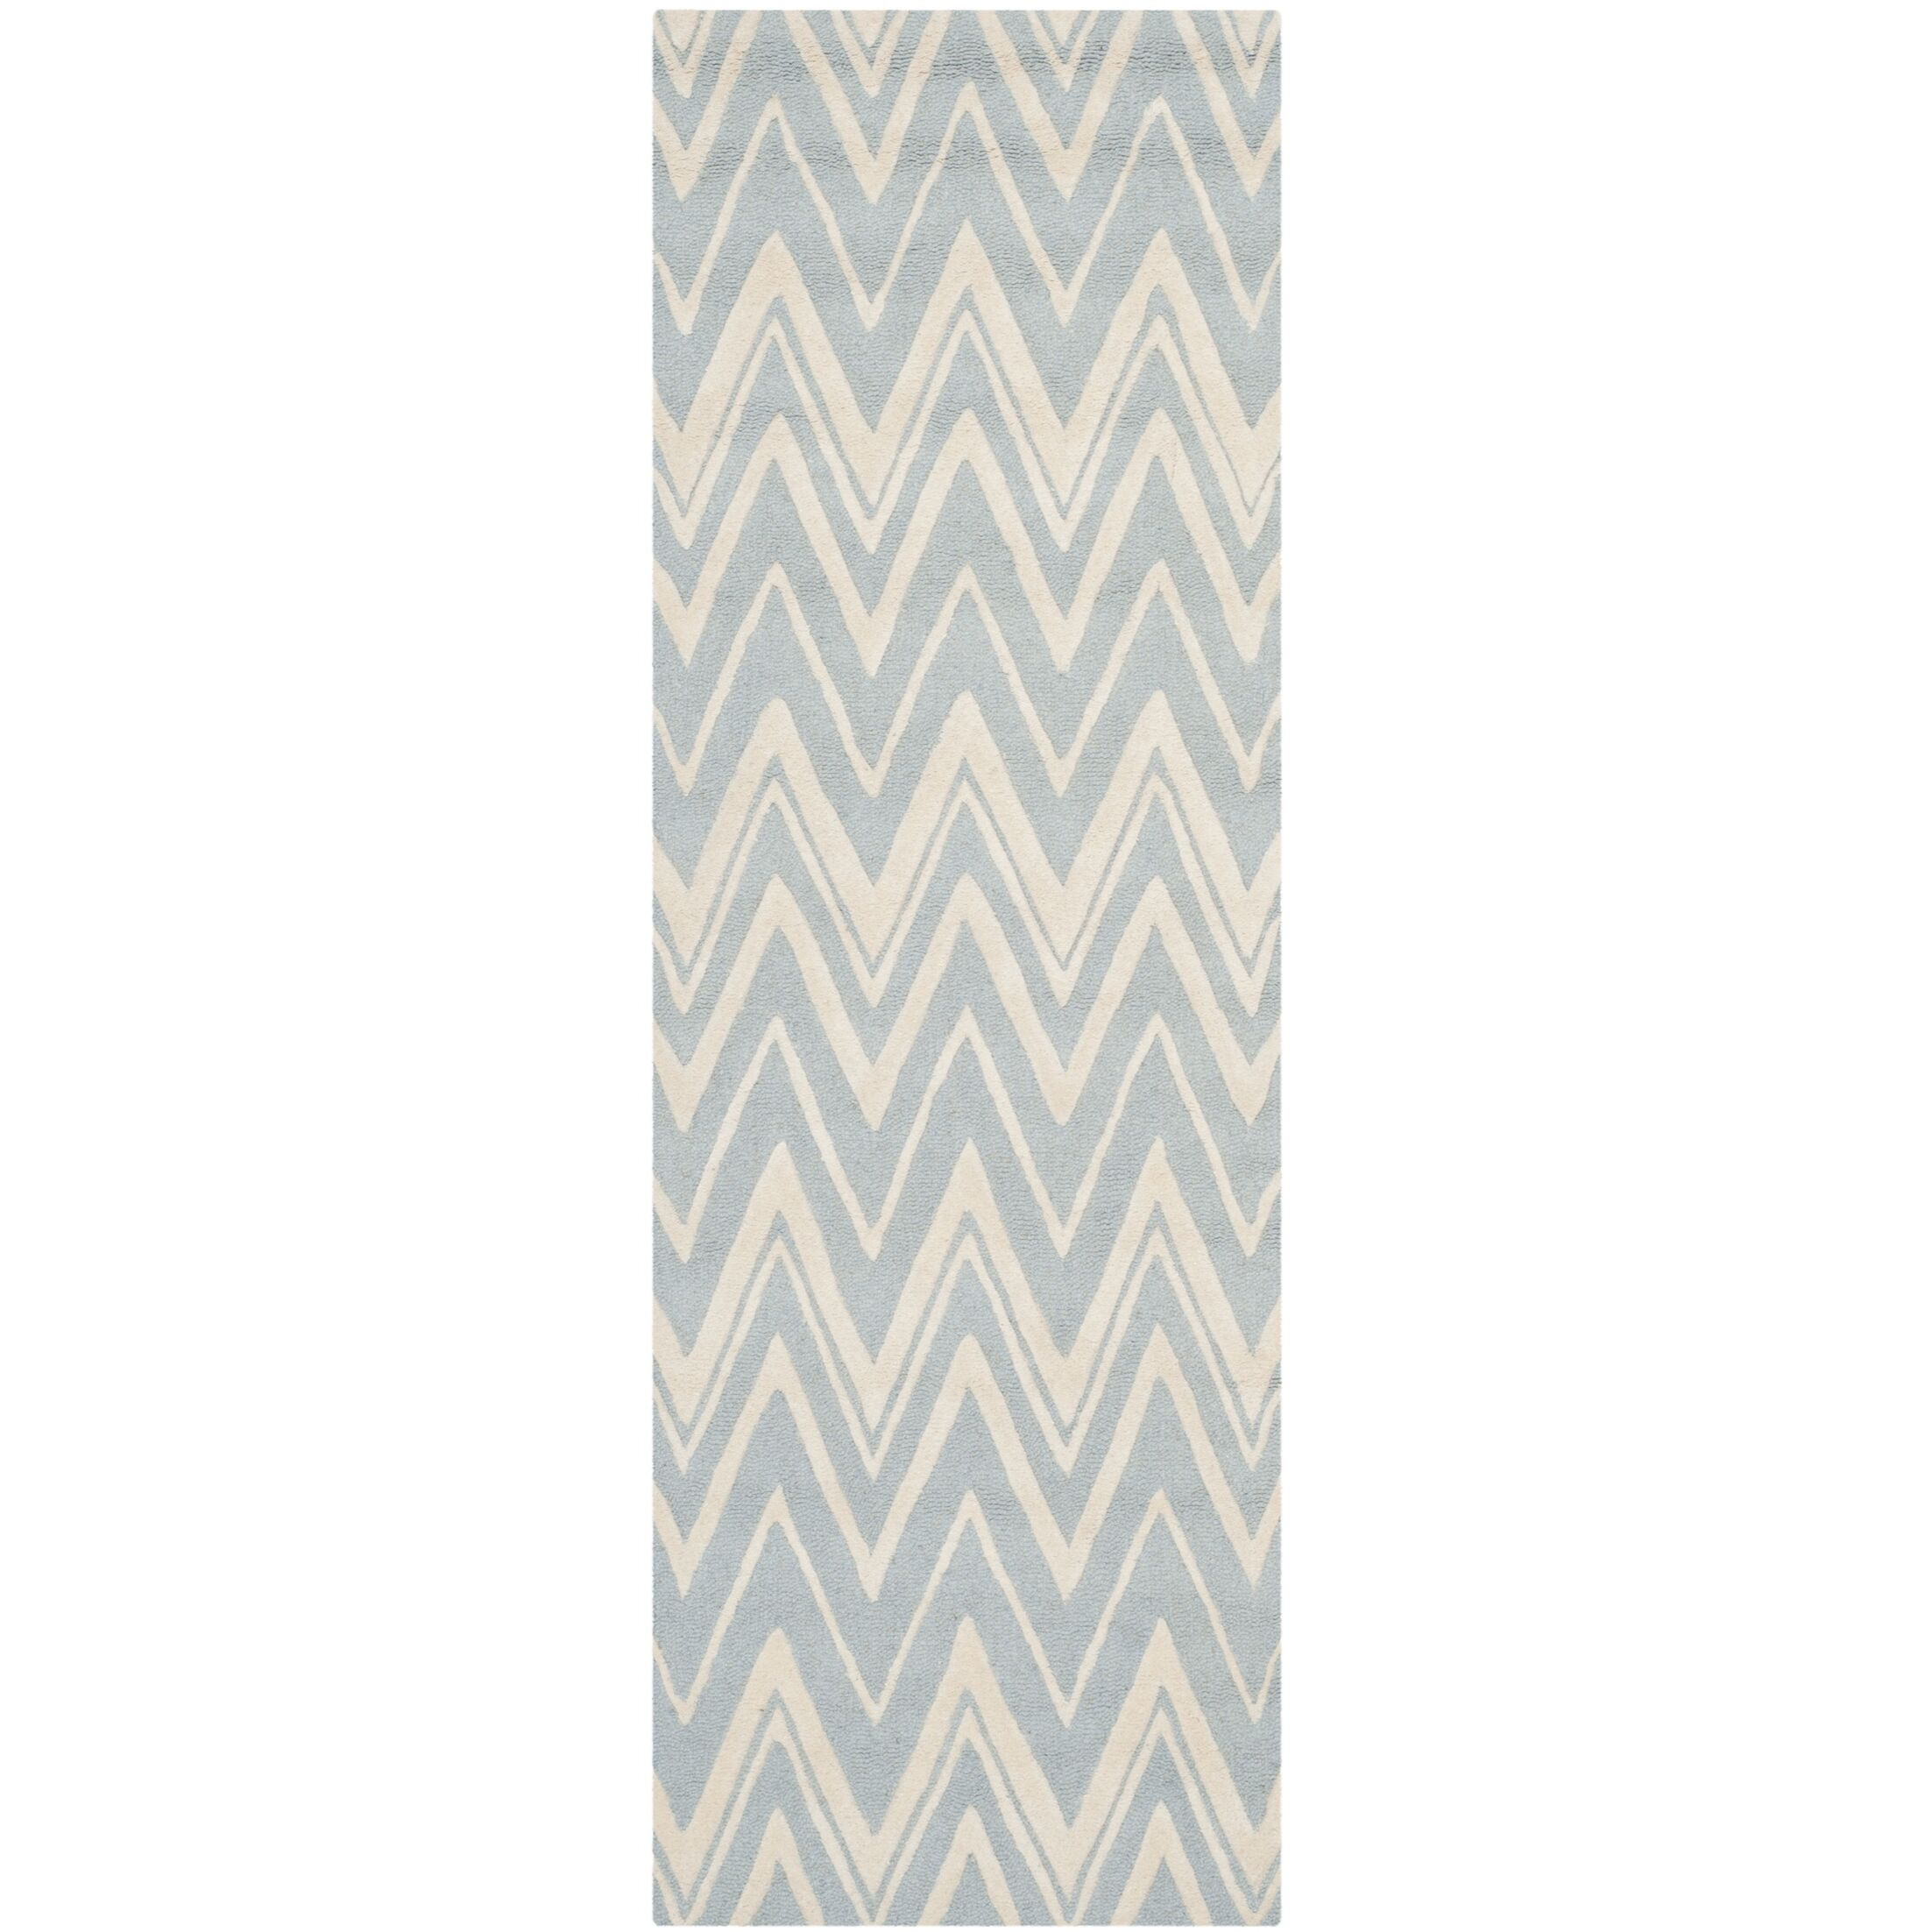 Martins Hand-Tufted Wool Blue/Ivory Area Rug Rug Size: Runner 2'6